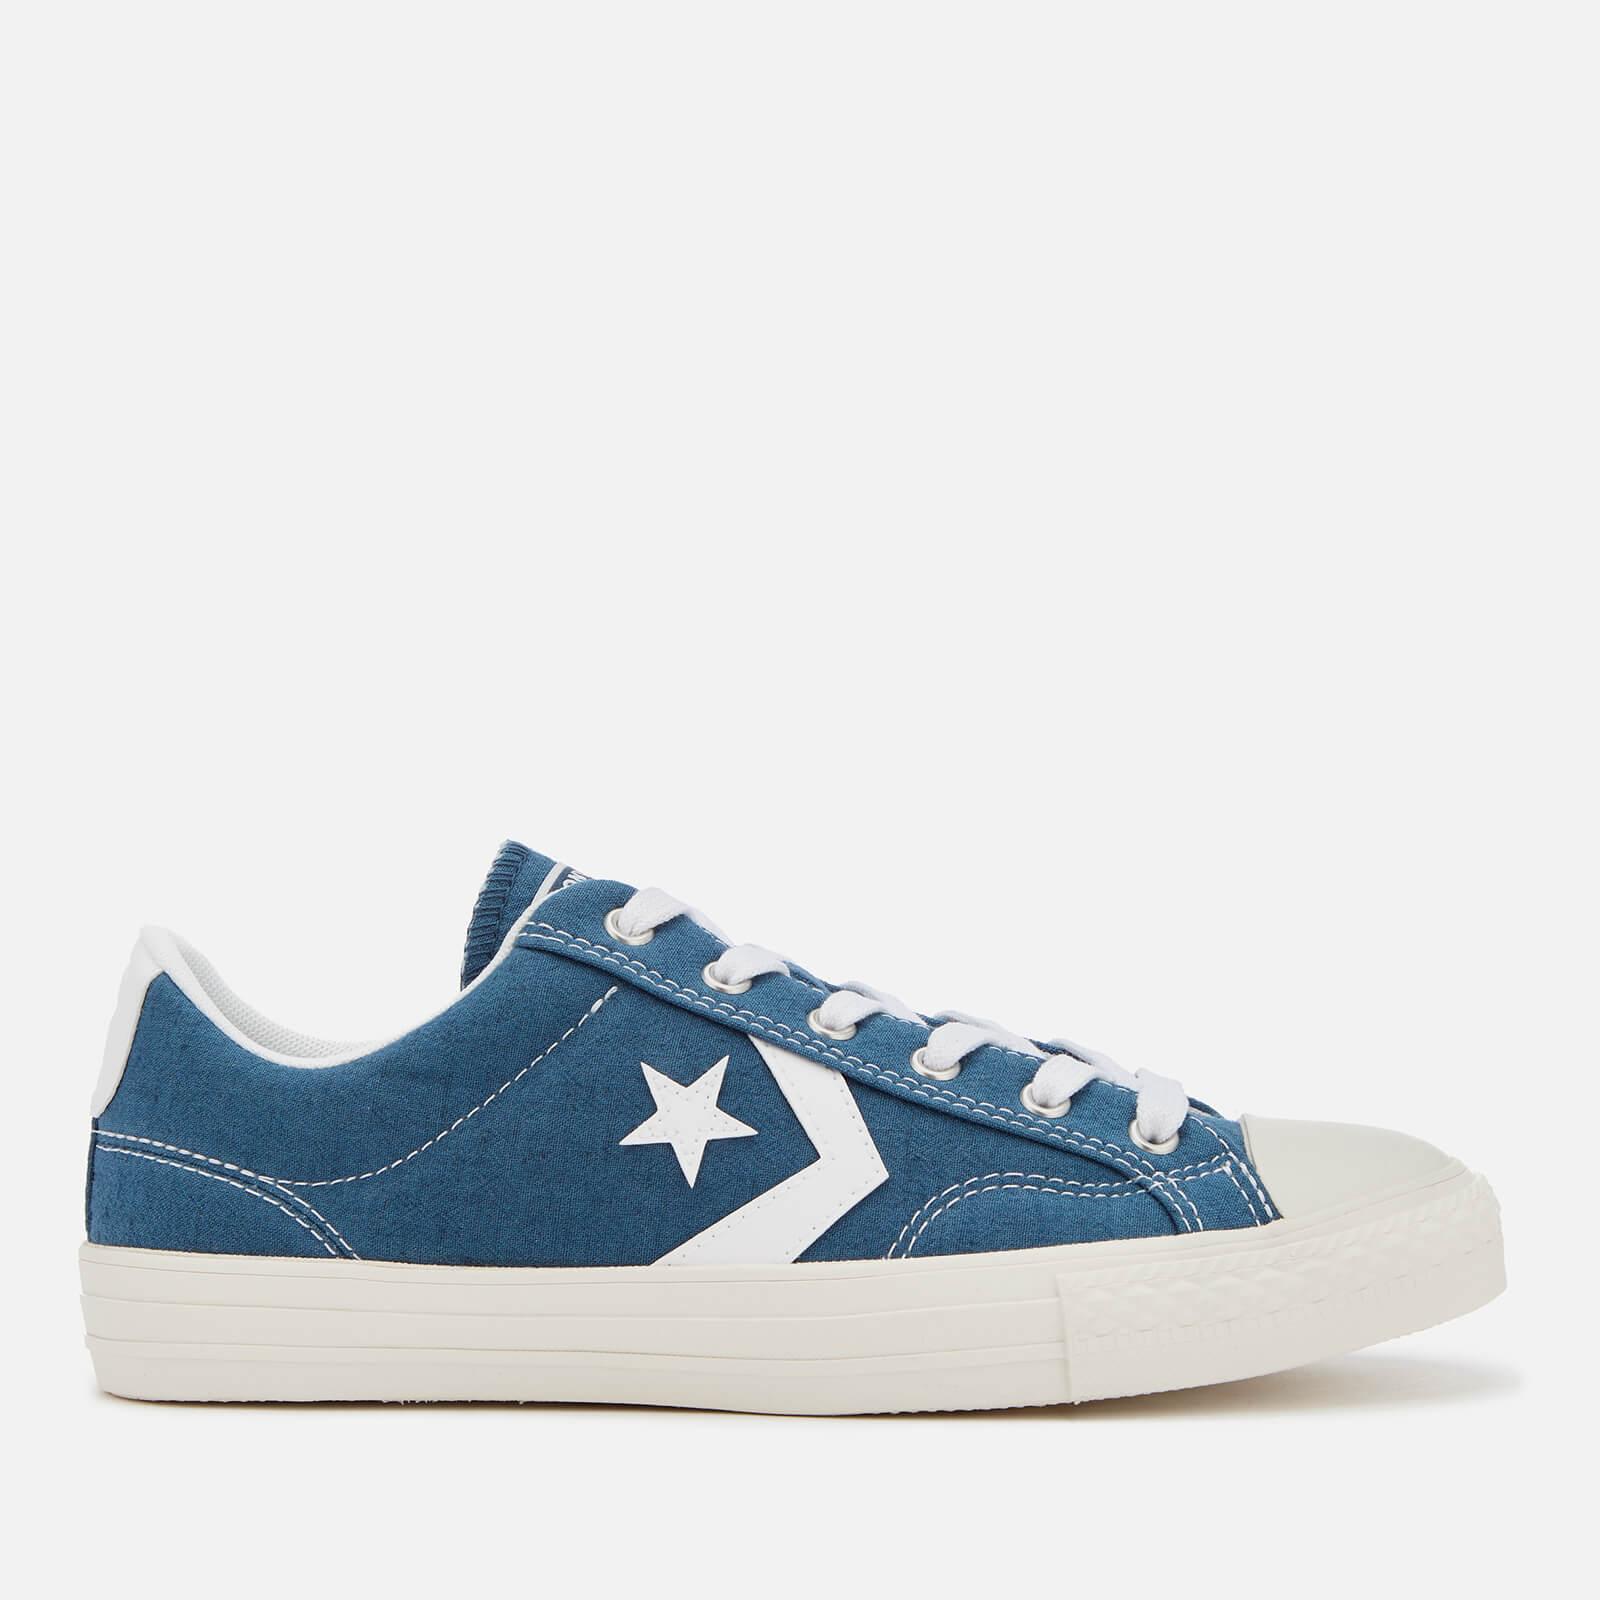 590dbd1622f3 Converse Men s Star Player Ox Trainers - Mason Blue White Mens Footwear